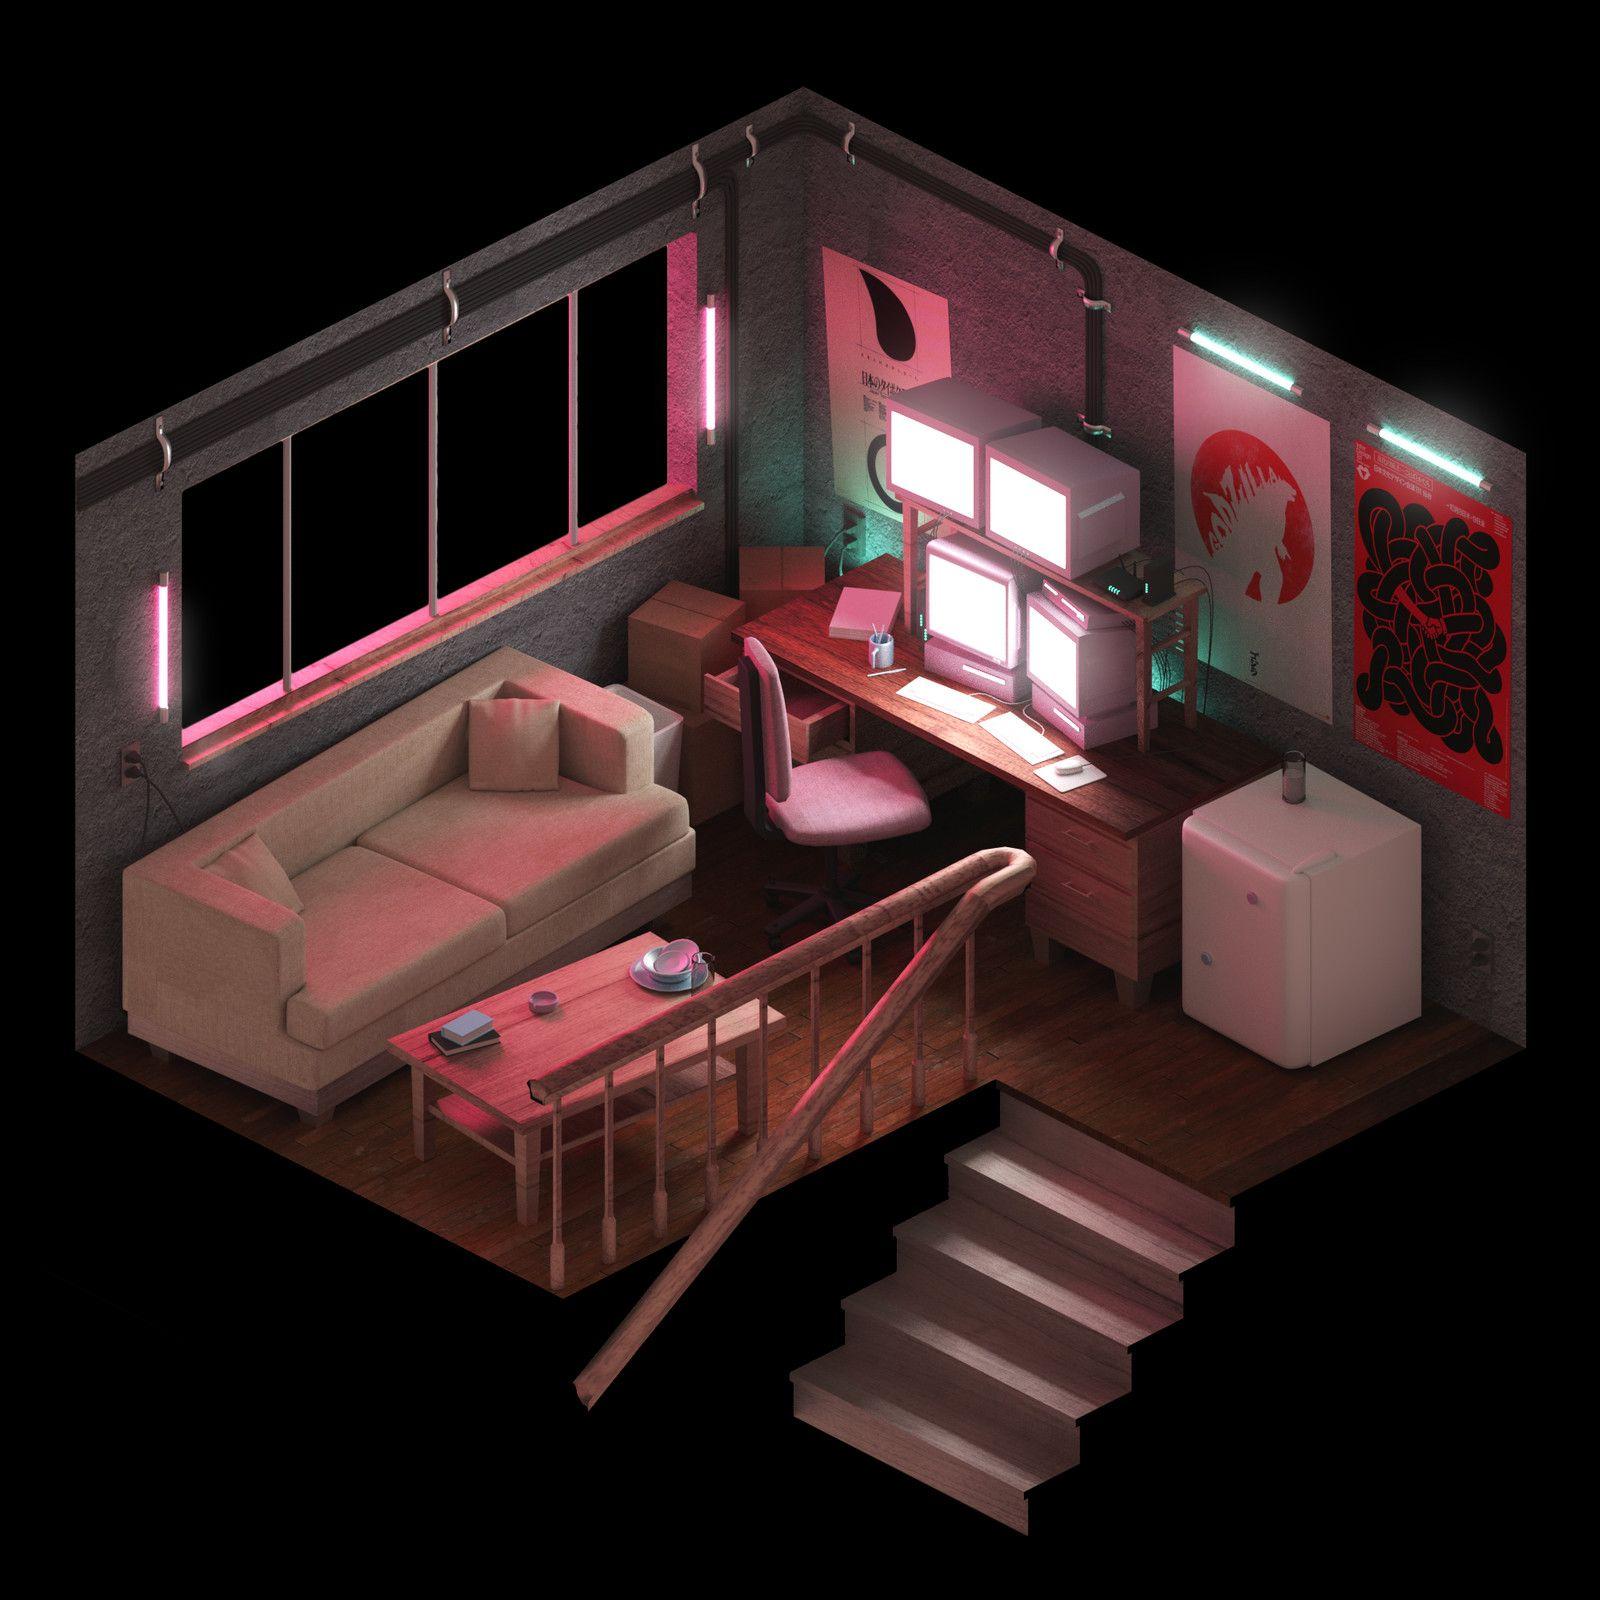 New Room Design